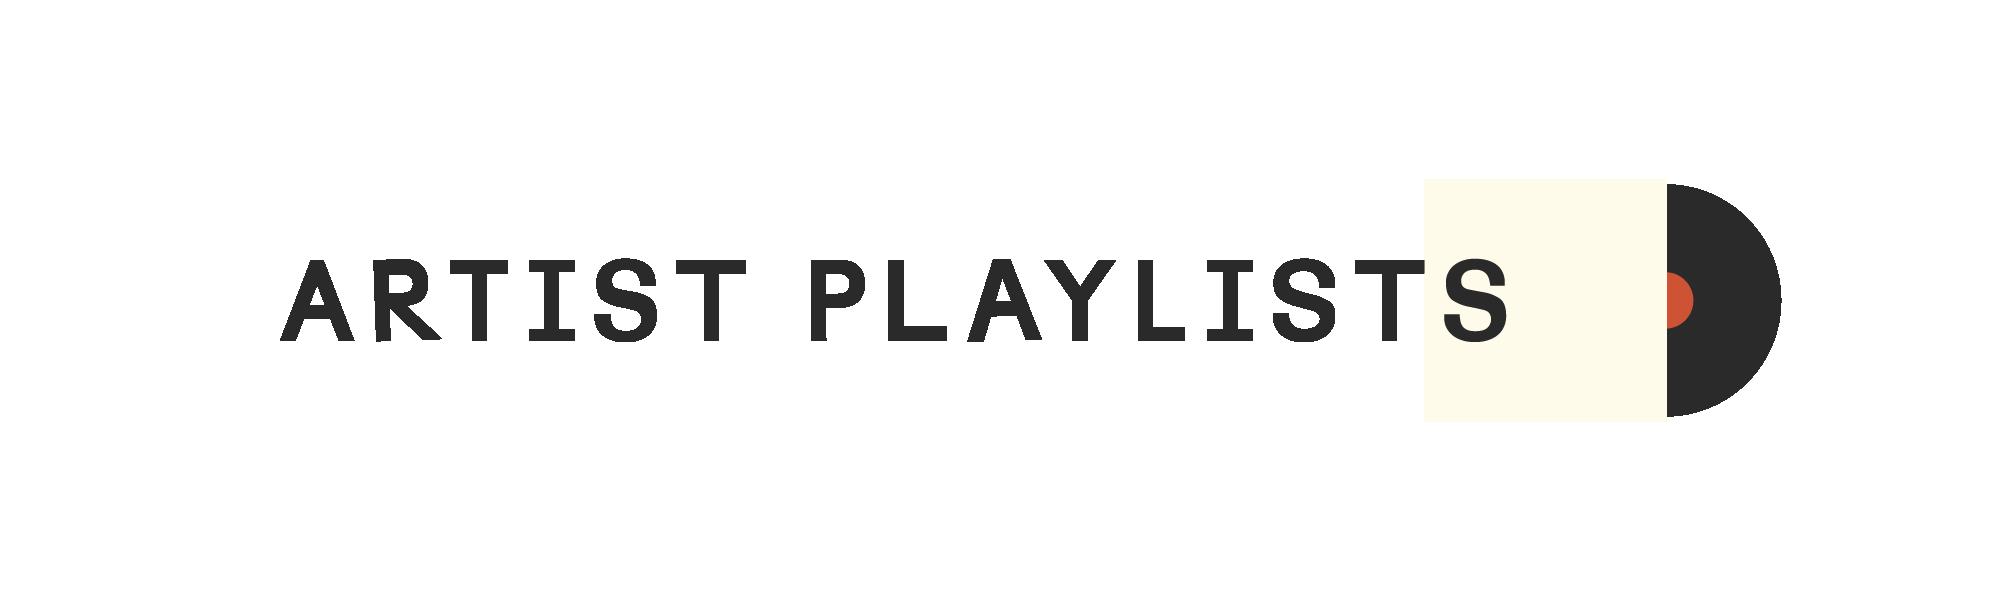 Artist Playlists